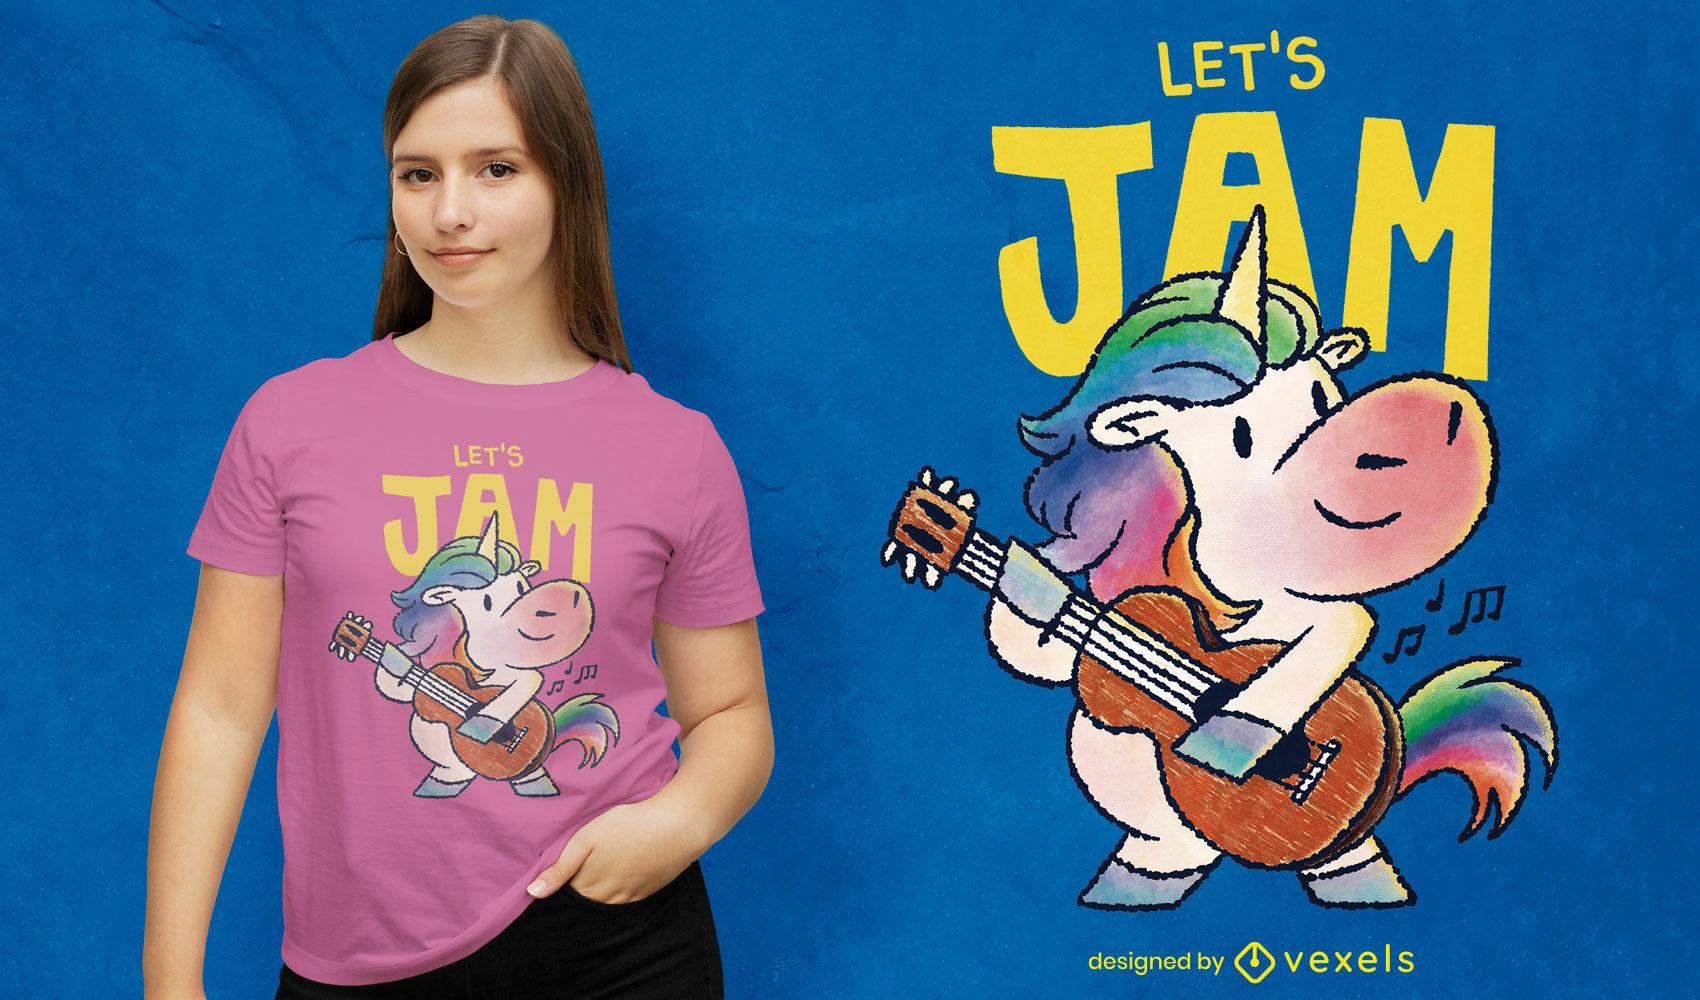 Guitarist unicorn psd t-shirt design doodle